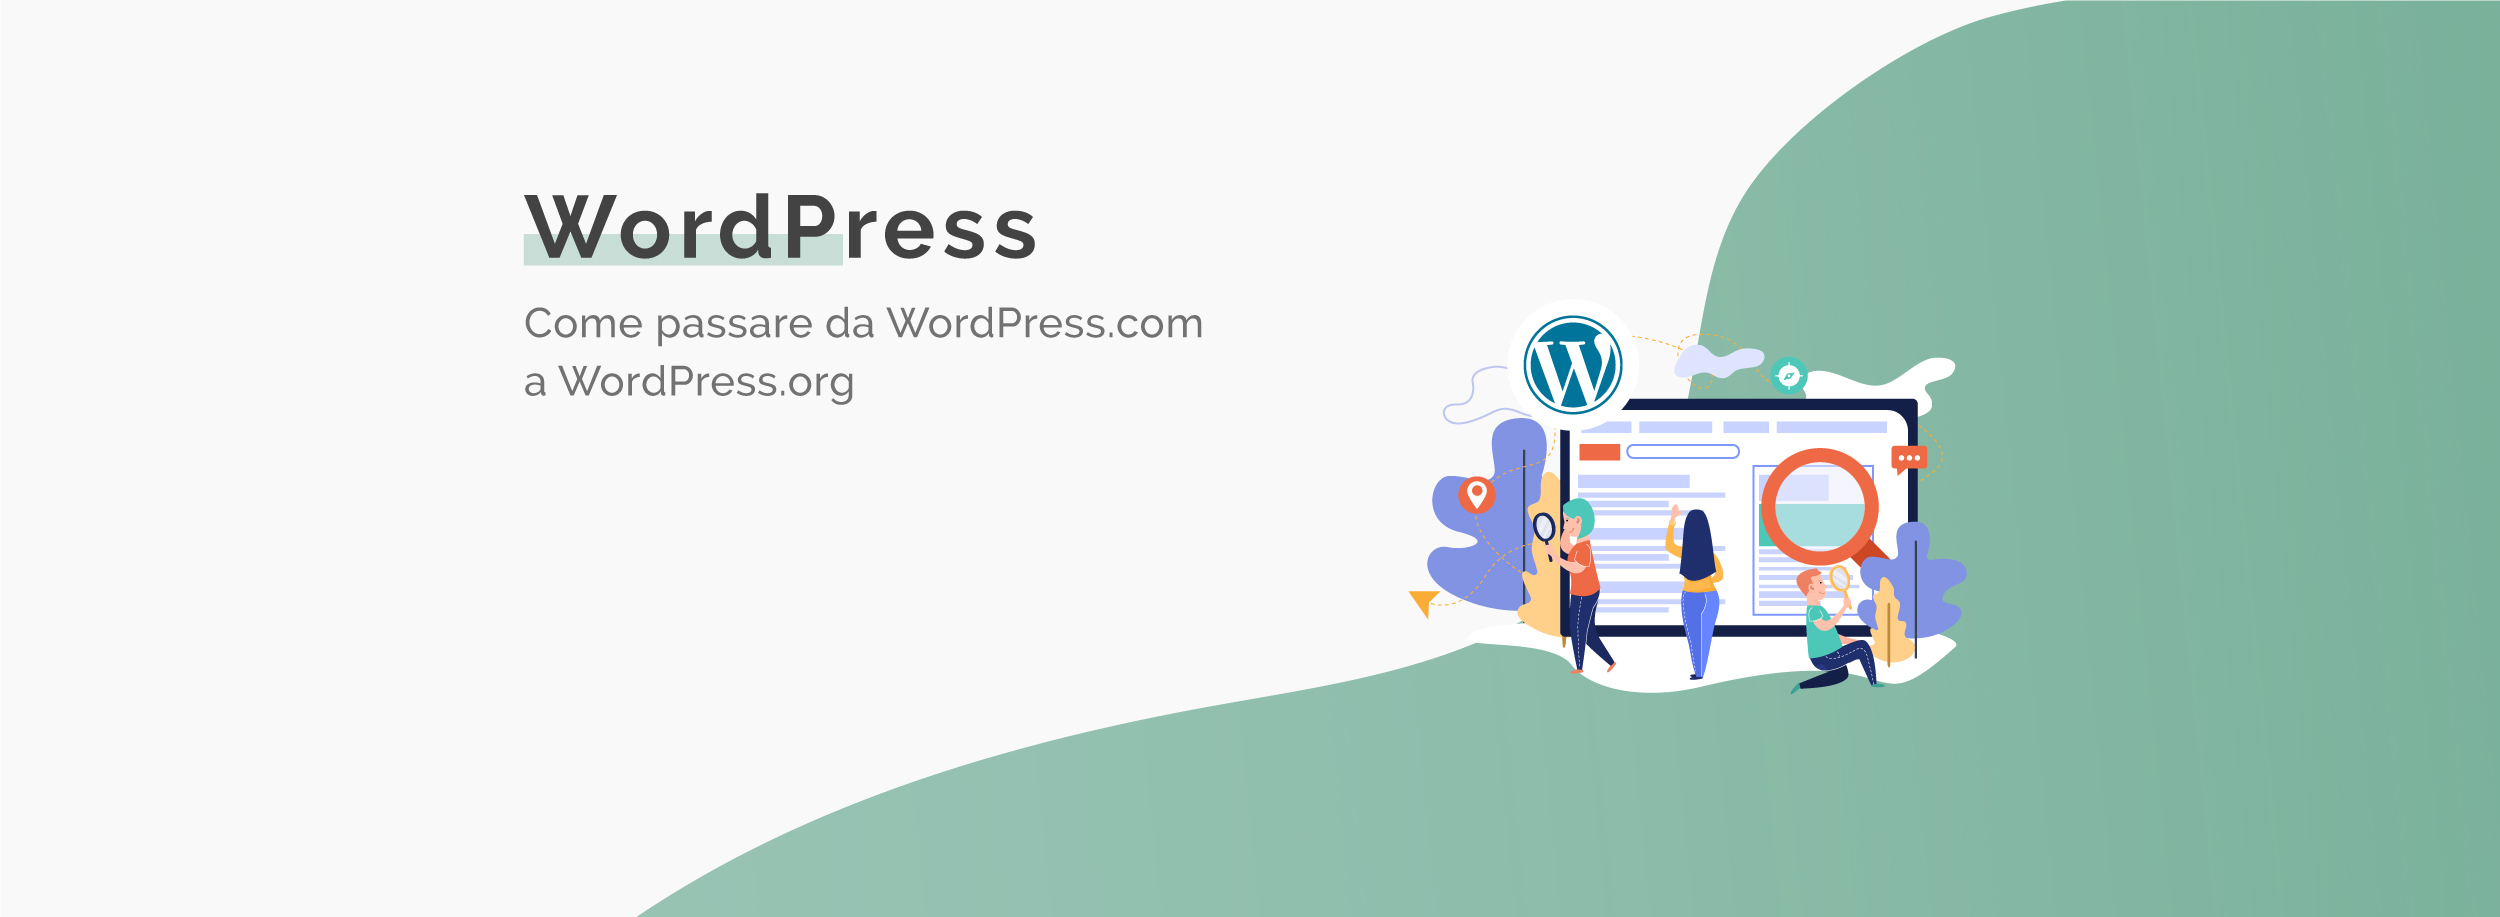 Come passare da wordpress.com a wordpress.org